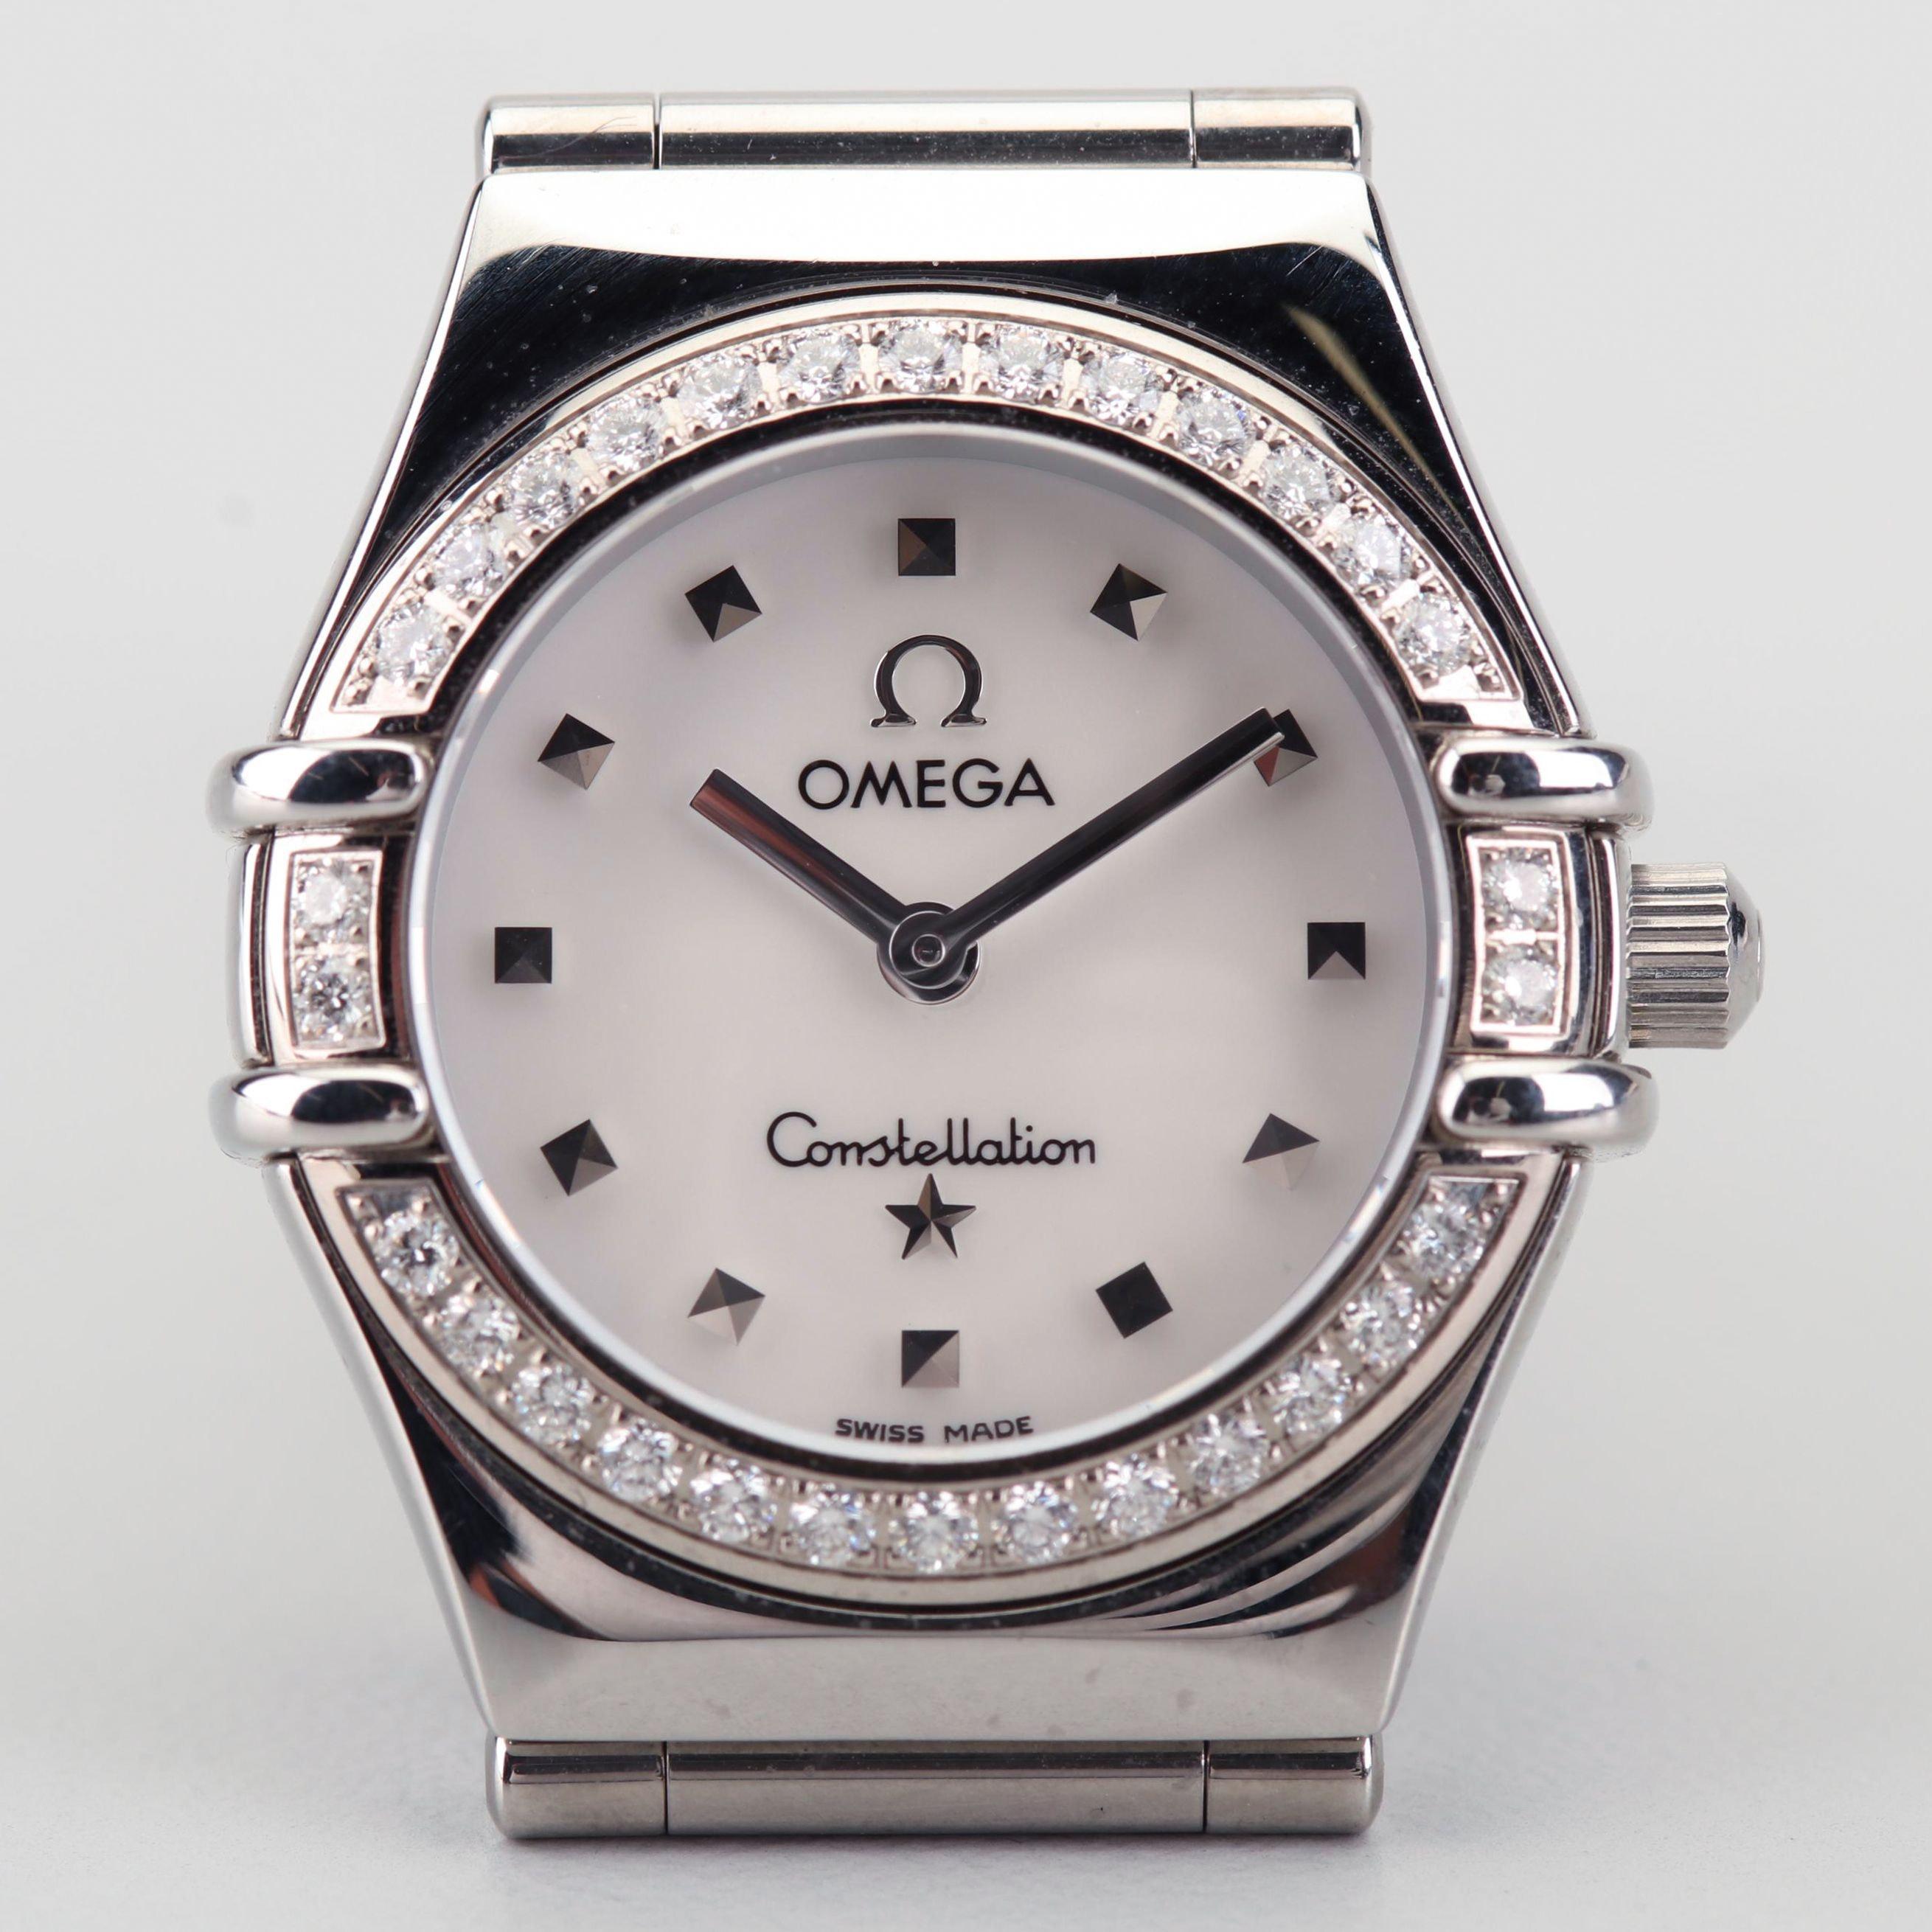 Omega Constellation 18K White Gold Diamond Bezel Stainless Steel Wristwatch